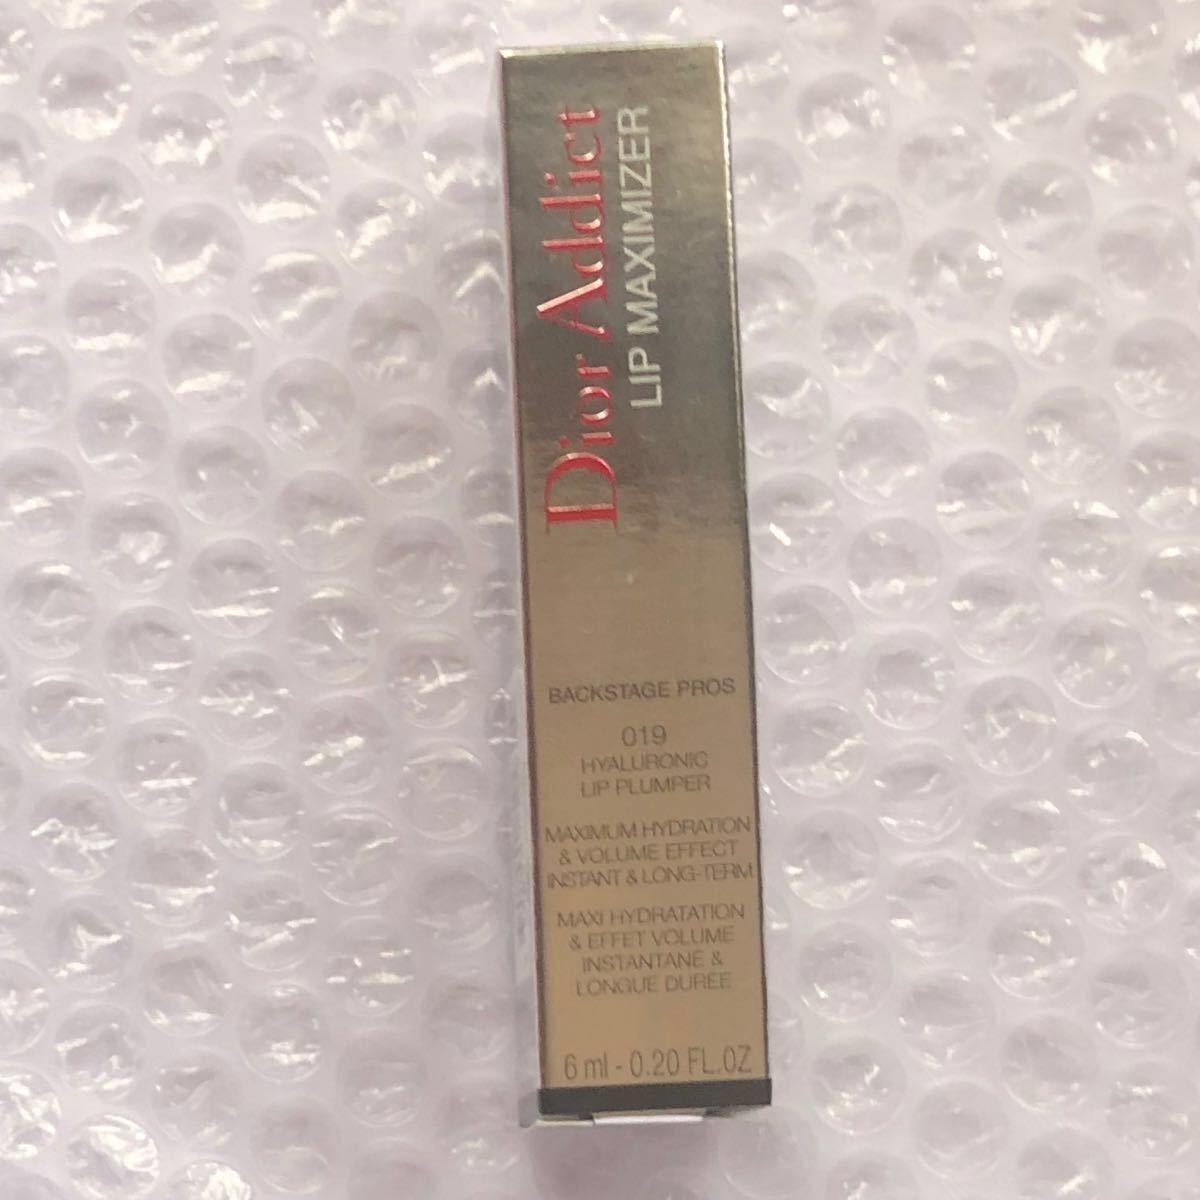 Dior アディクト リップ マキシマイザー 019 限定 グロス ギフト ボックス ラッピング プレゼント プレゼントボックス